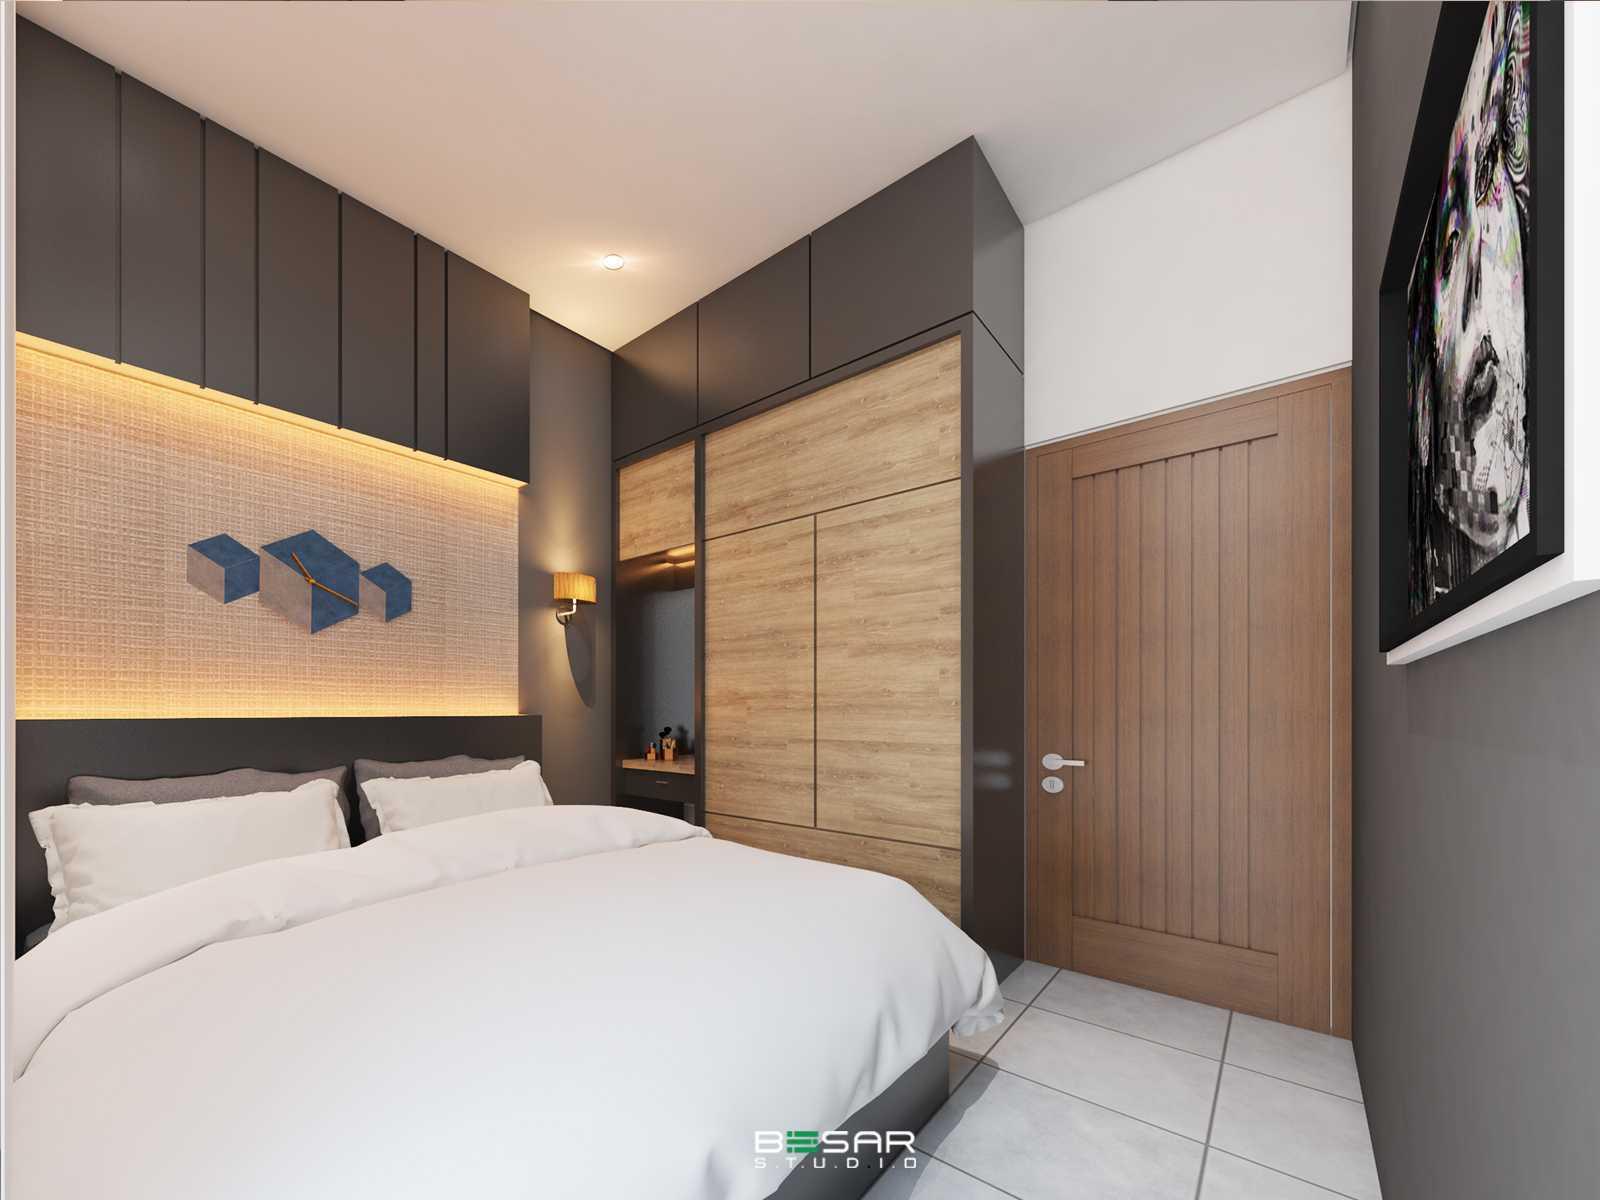 Studio Besar R-House, Cikarang Cikarang Utara, Bekasi, Jawa Barat, Indonesia Cikarang Utara, Bekasi, Jawa Barat, Indonesia Studio-Besar-R-House   60034